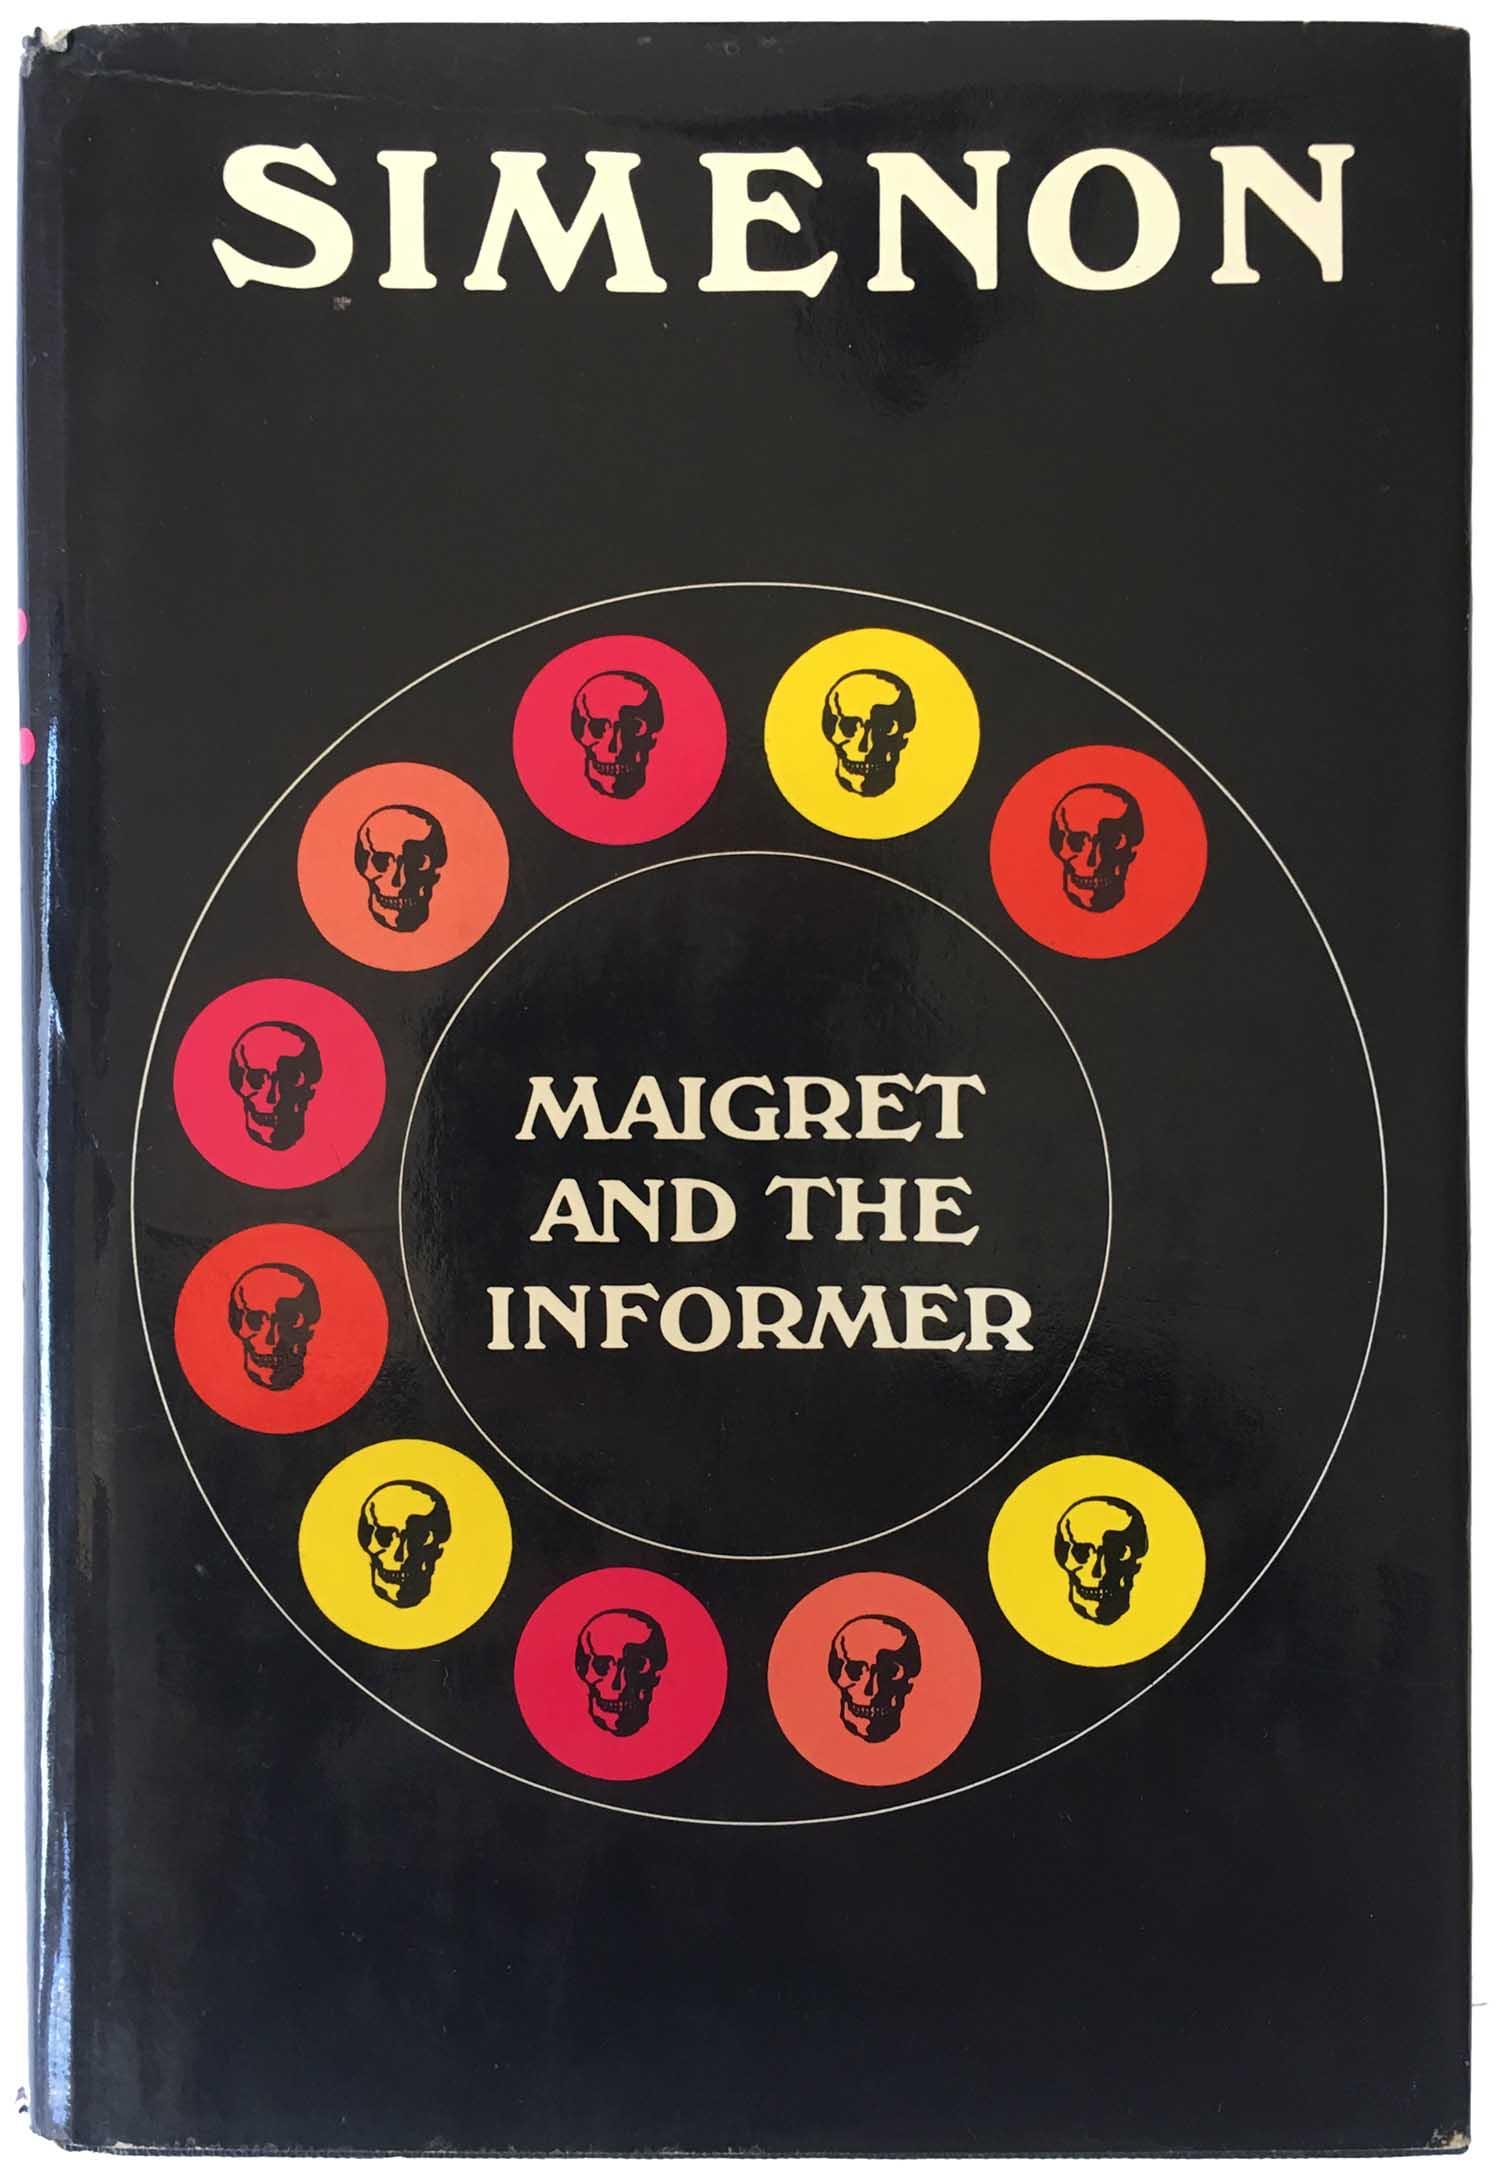 https://justseeds.org/wp-content/uploads/Simenon_MaigretInformer.jpg